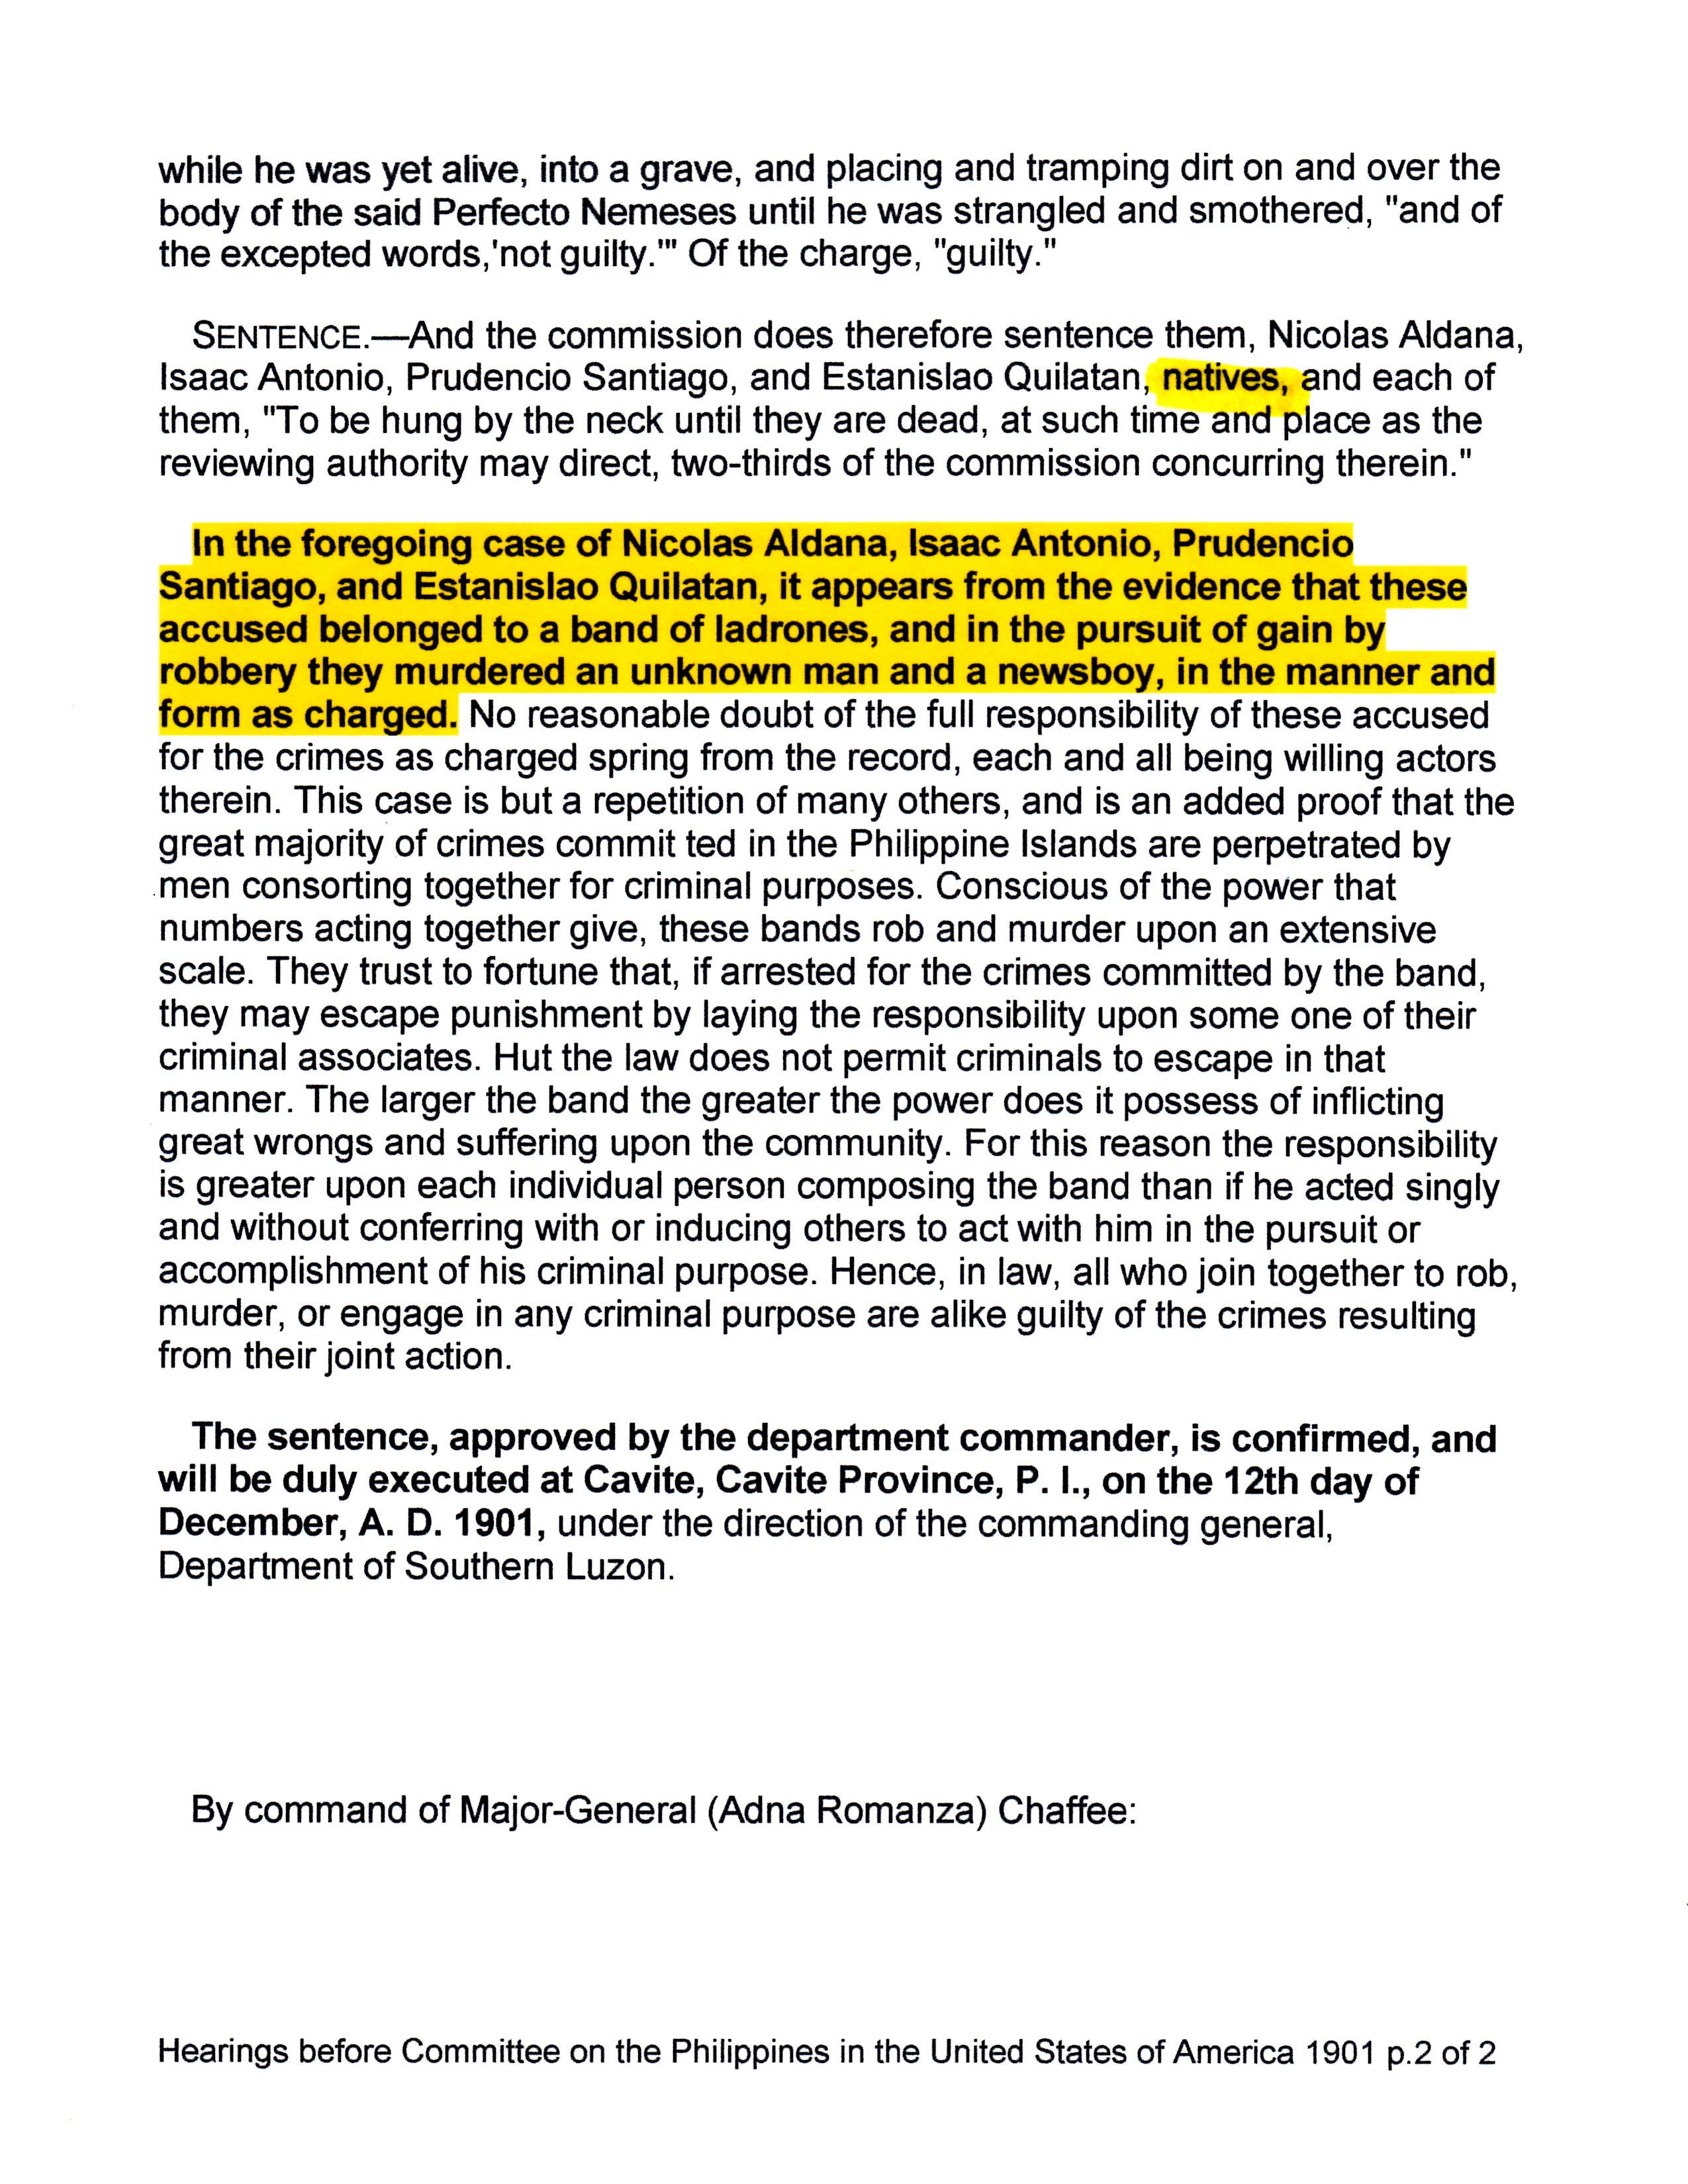 Blog - Nicolas Aldana - Hearing 1901 p.2